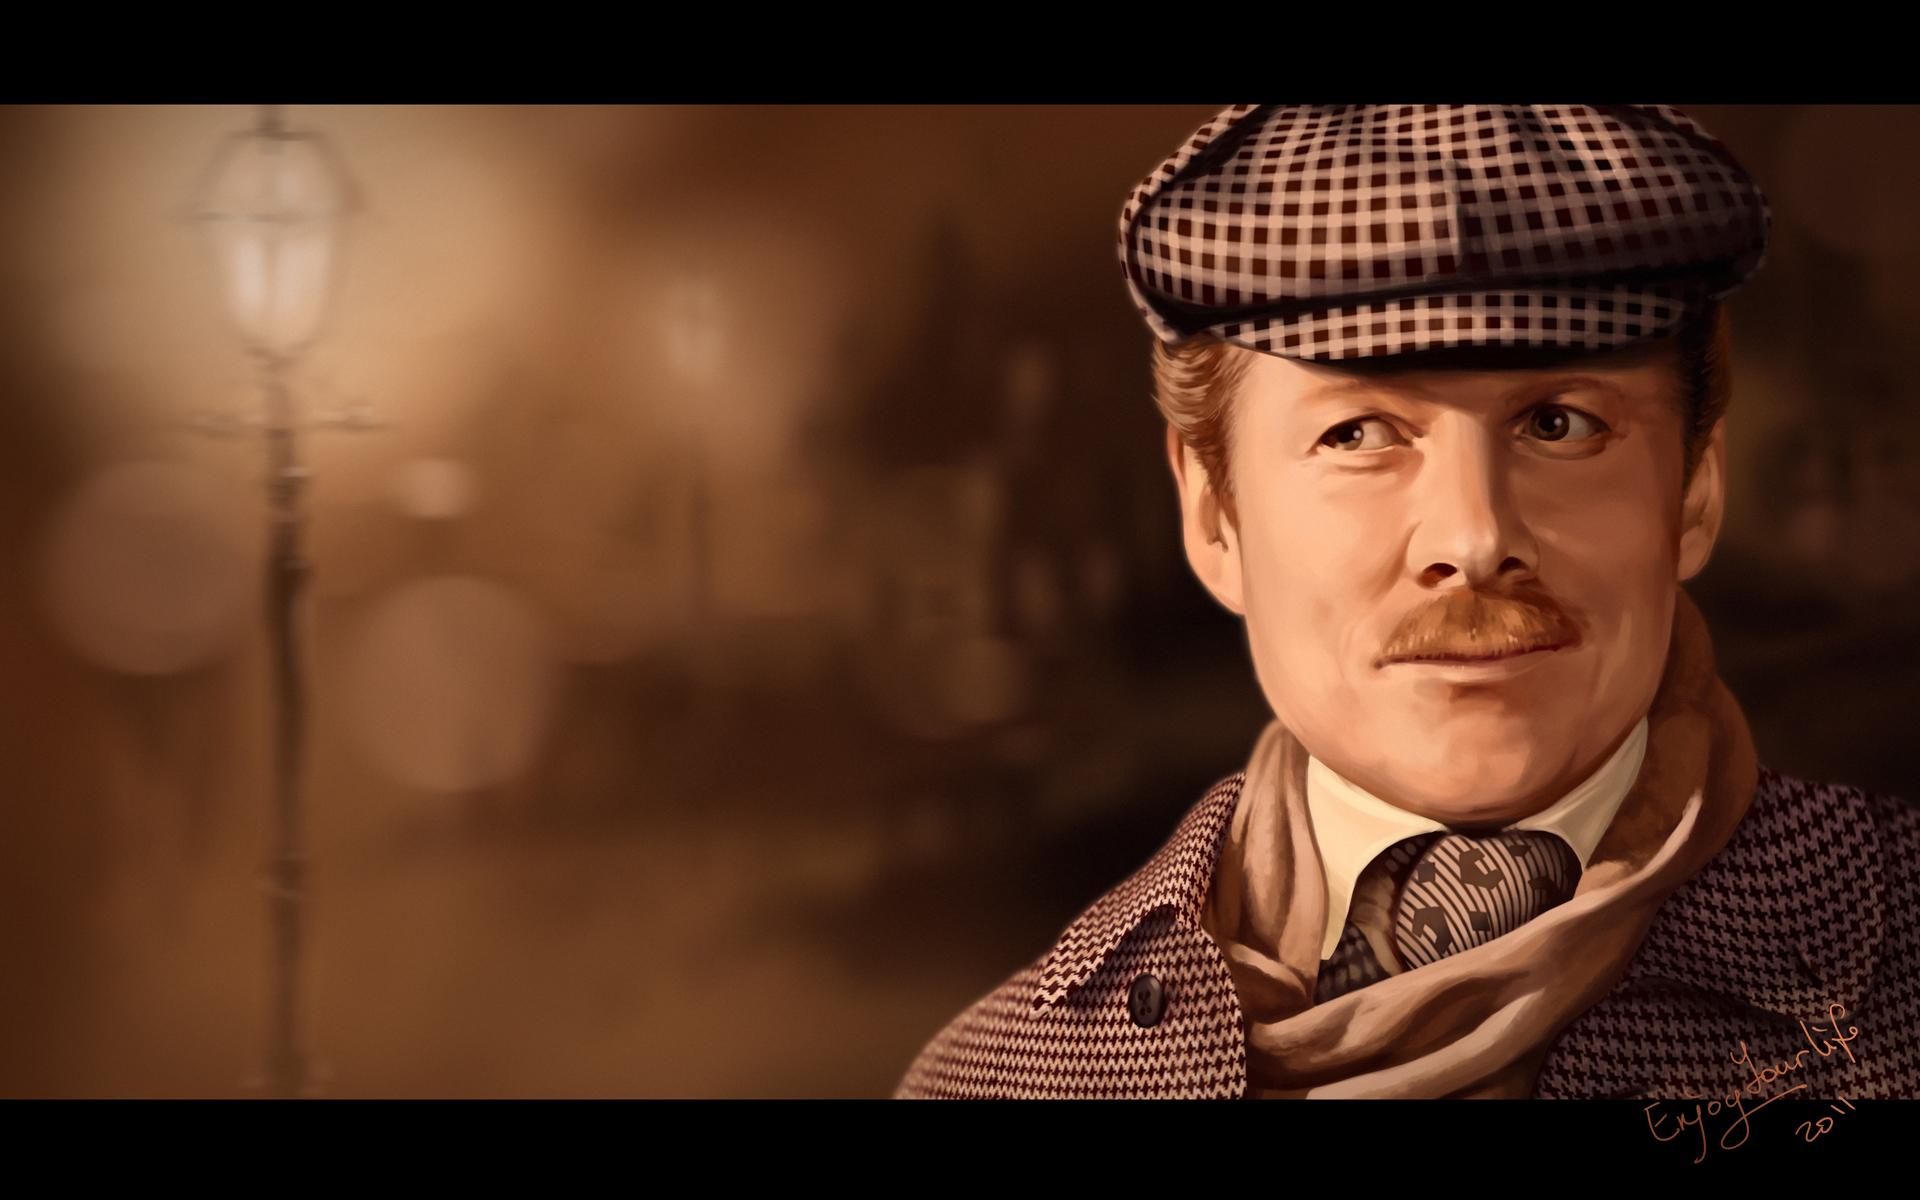 V. Solomin as Dr. J. Watson